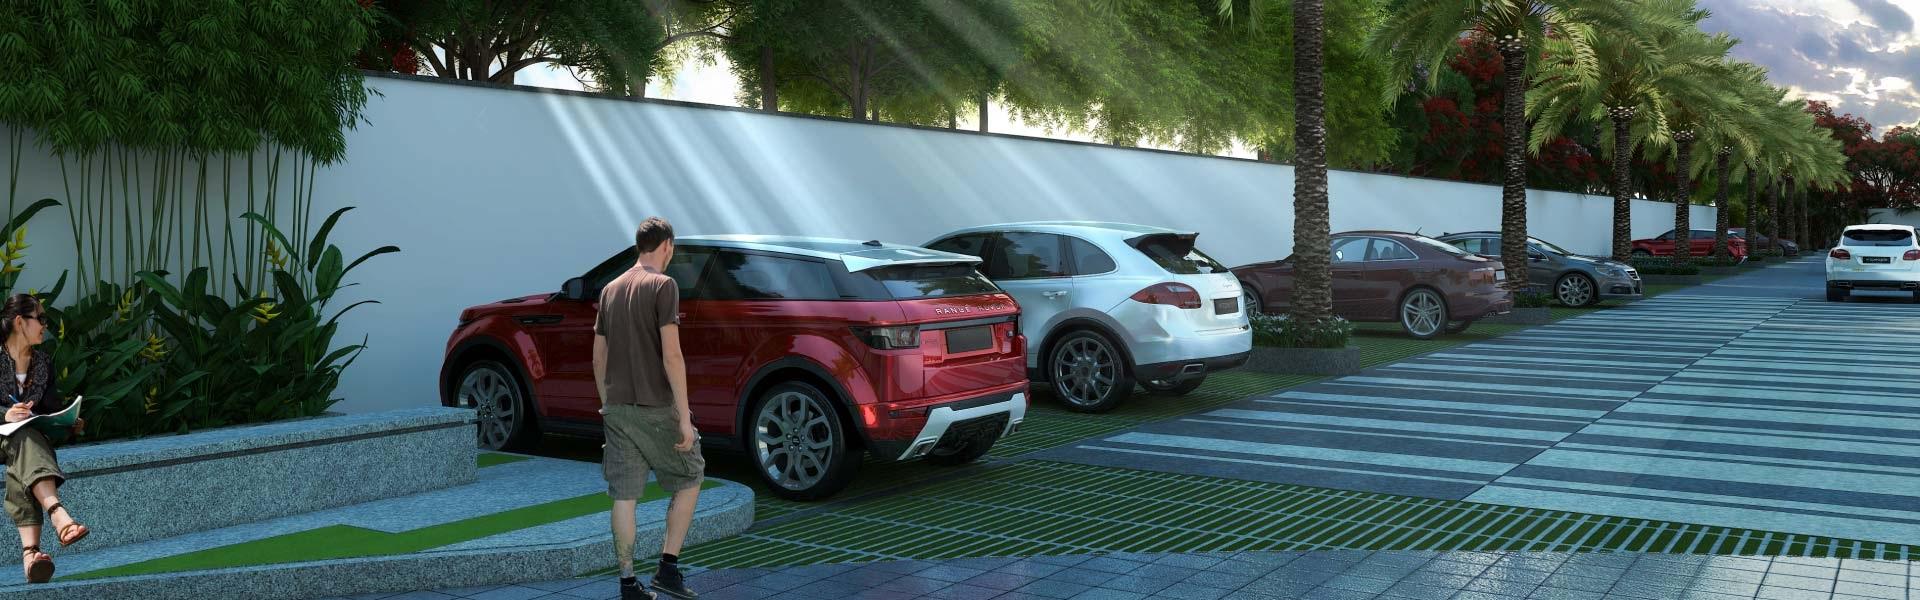 dsr rr avenues amenities features2